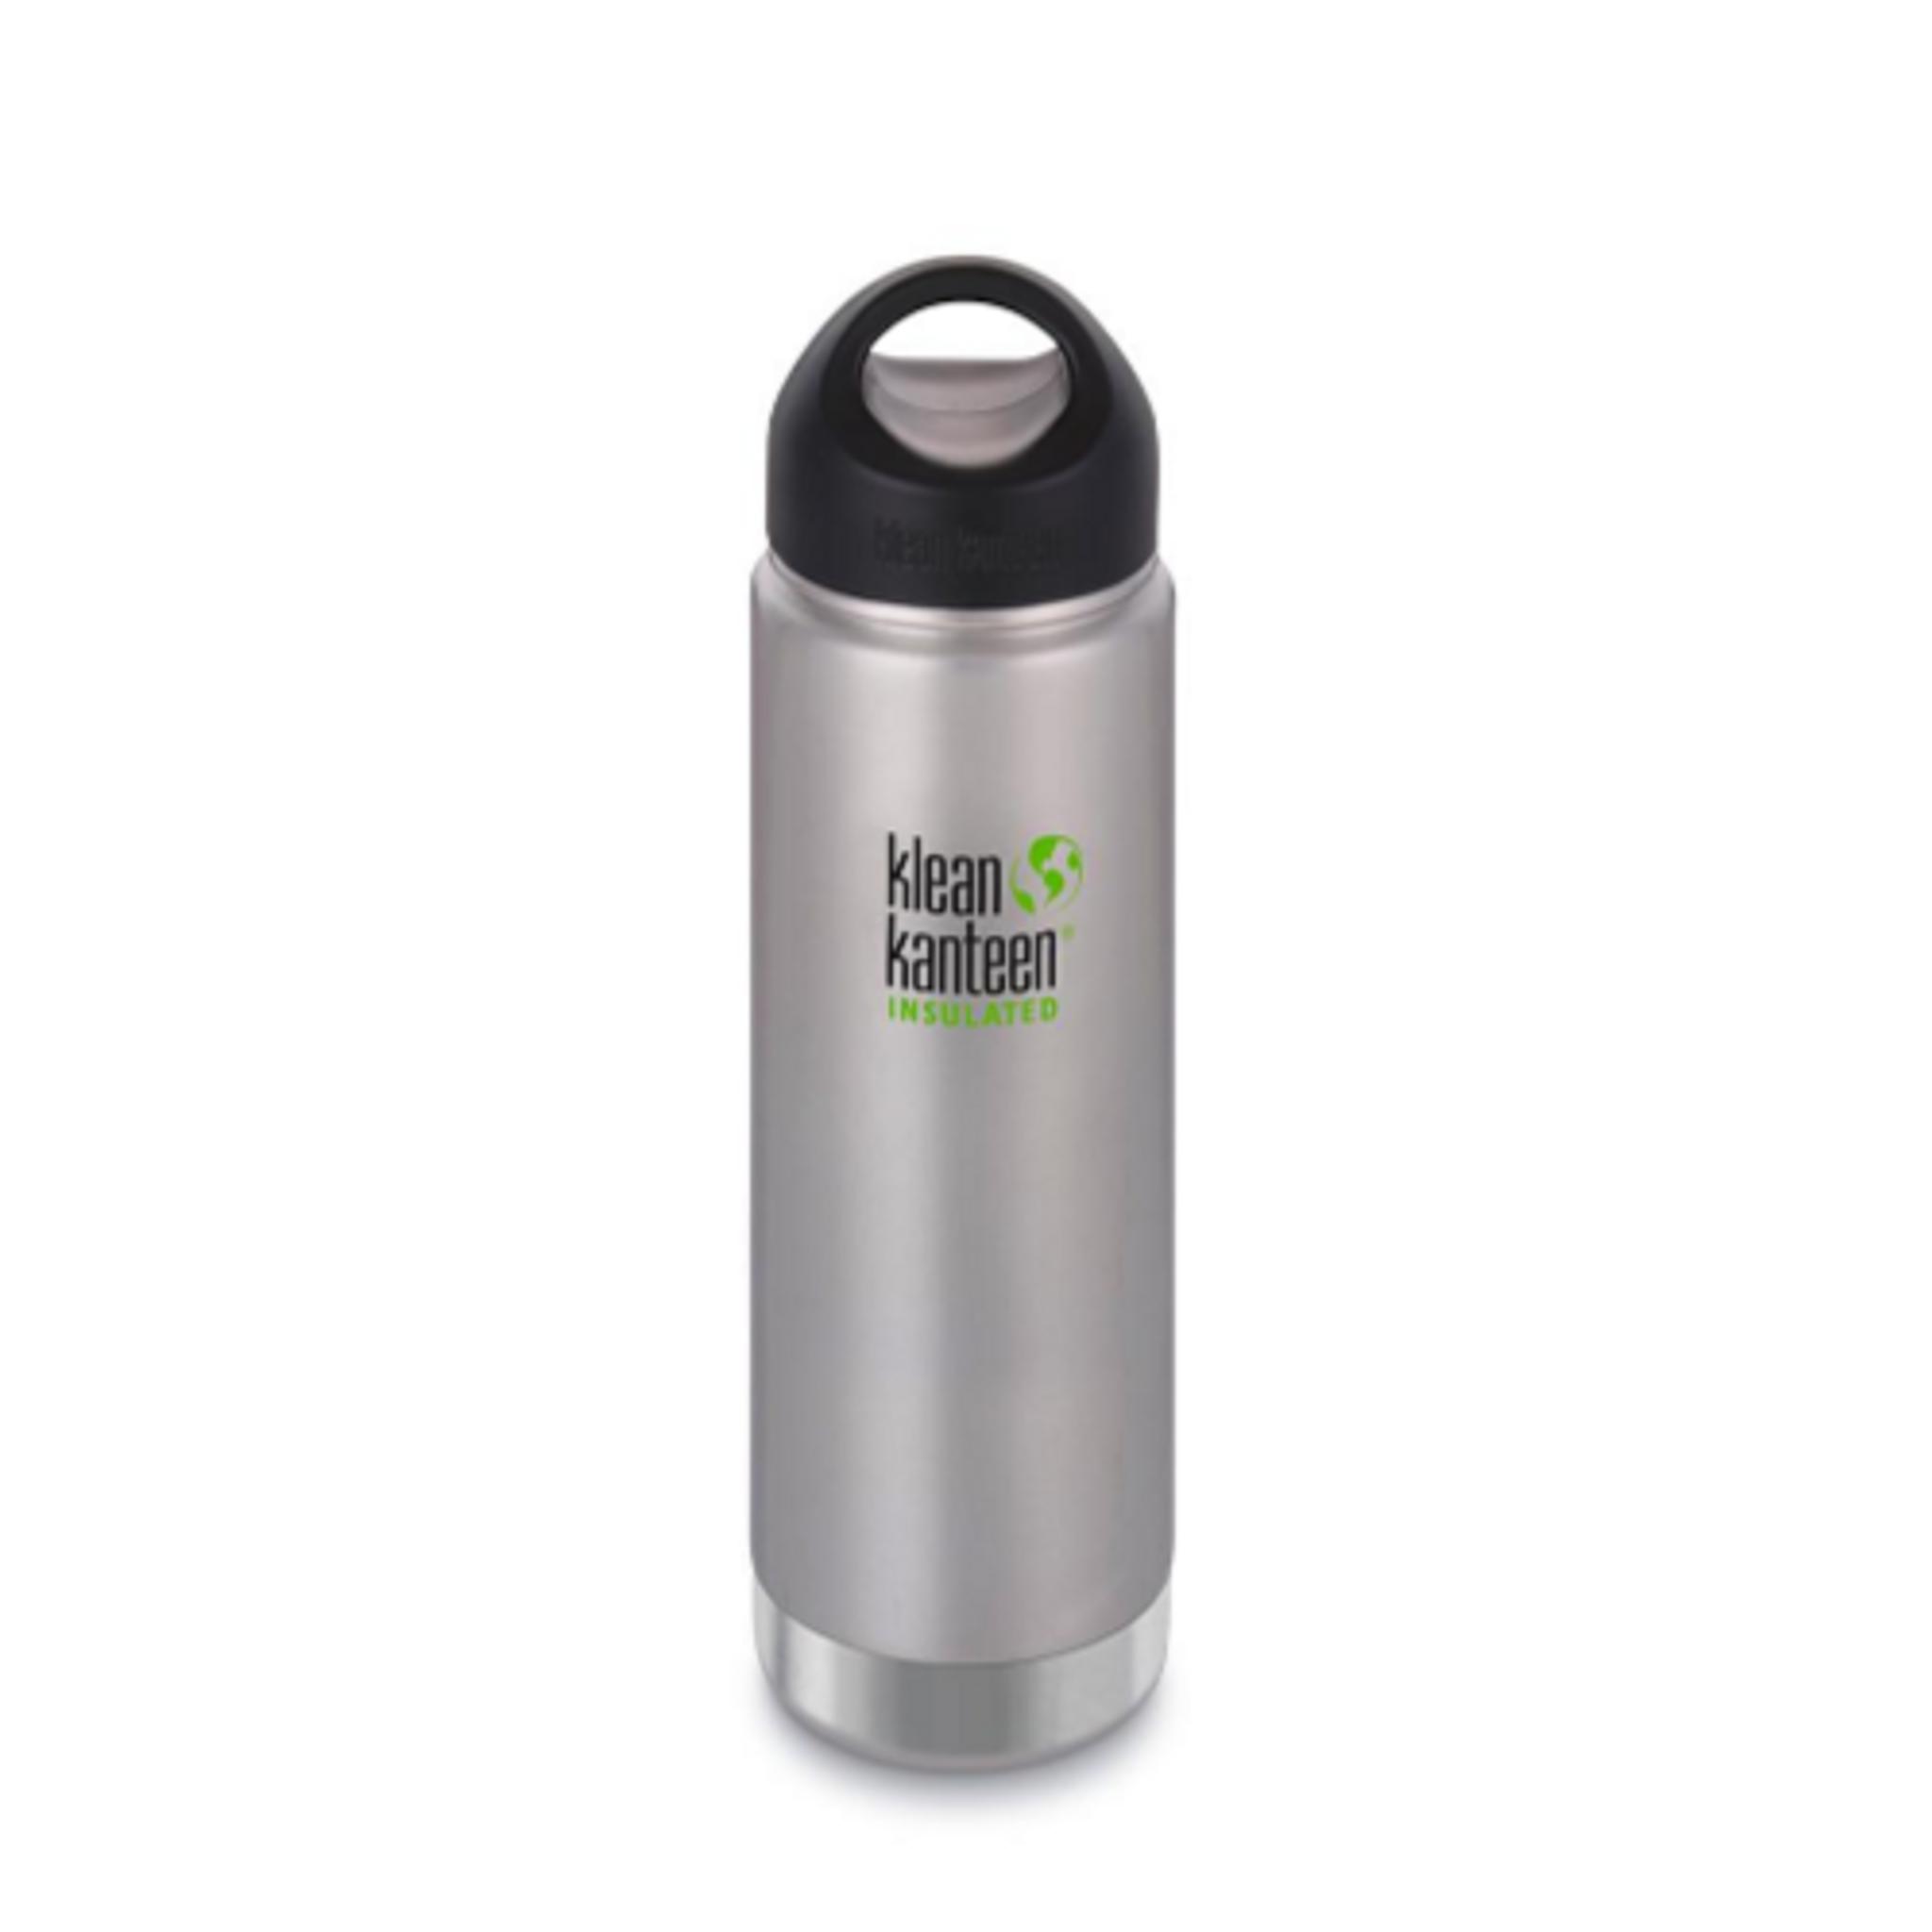 Klean Kanteen Wide Insulated Stainless Steel Bottle W Loop Cap 20 Ounce